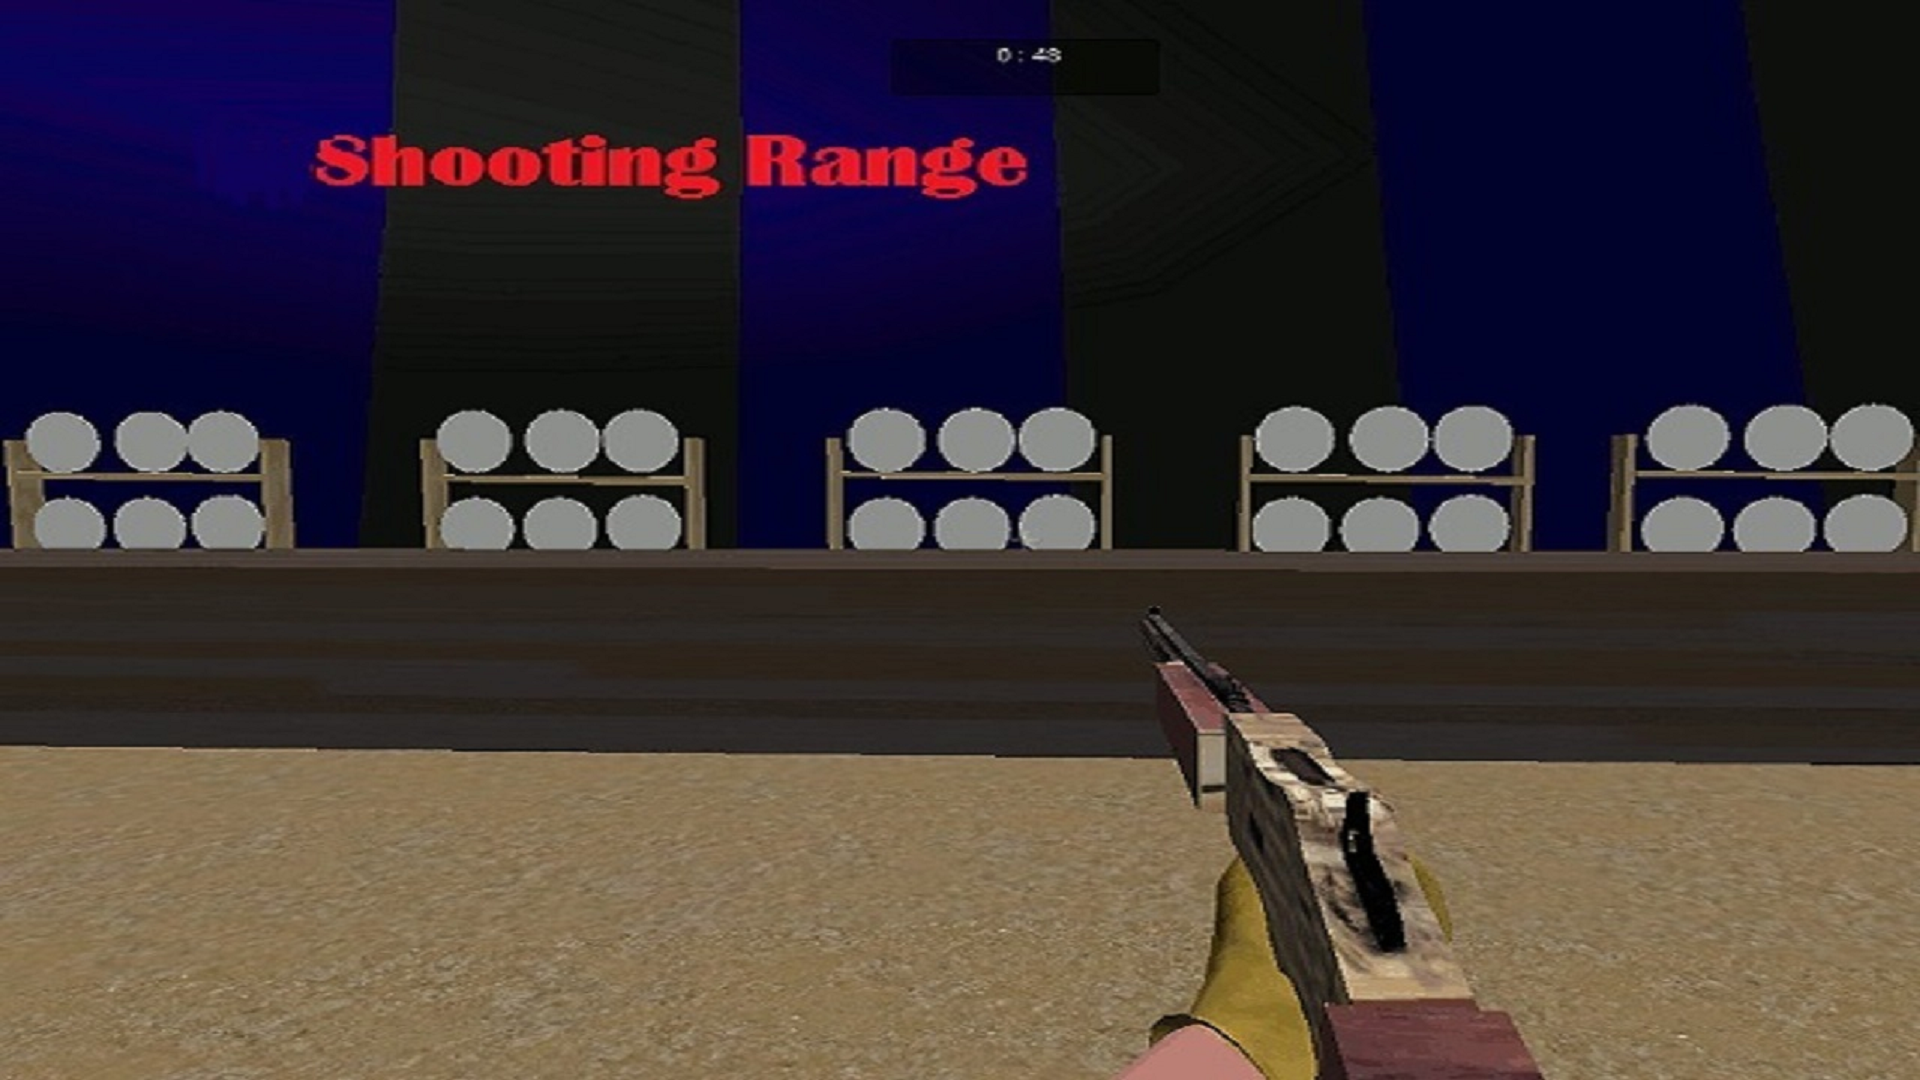 Shooting Range by Thornbury Software